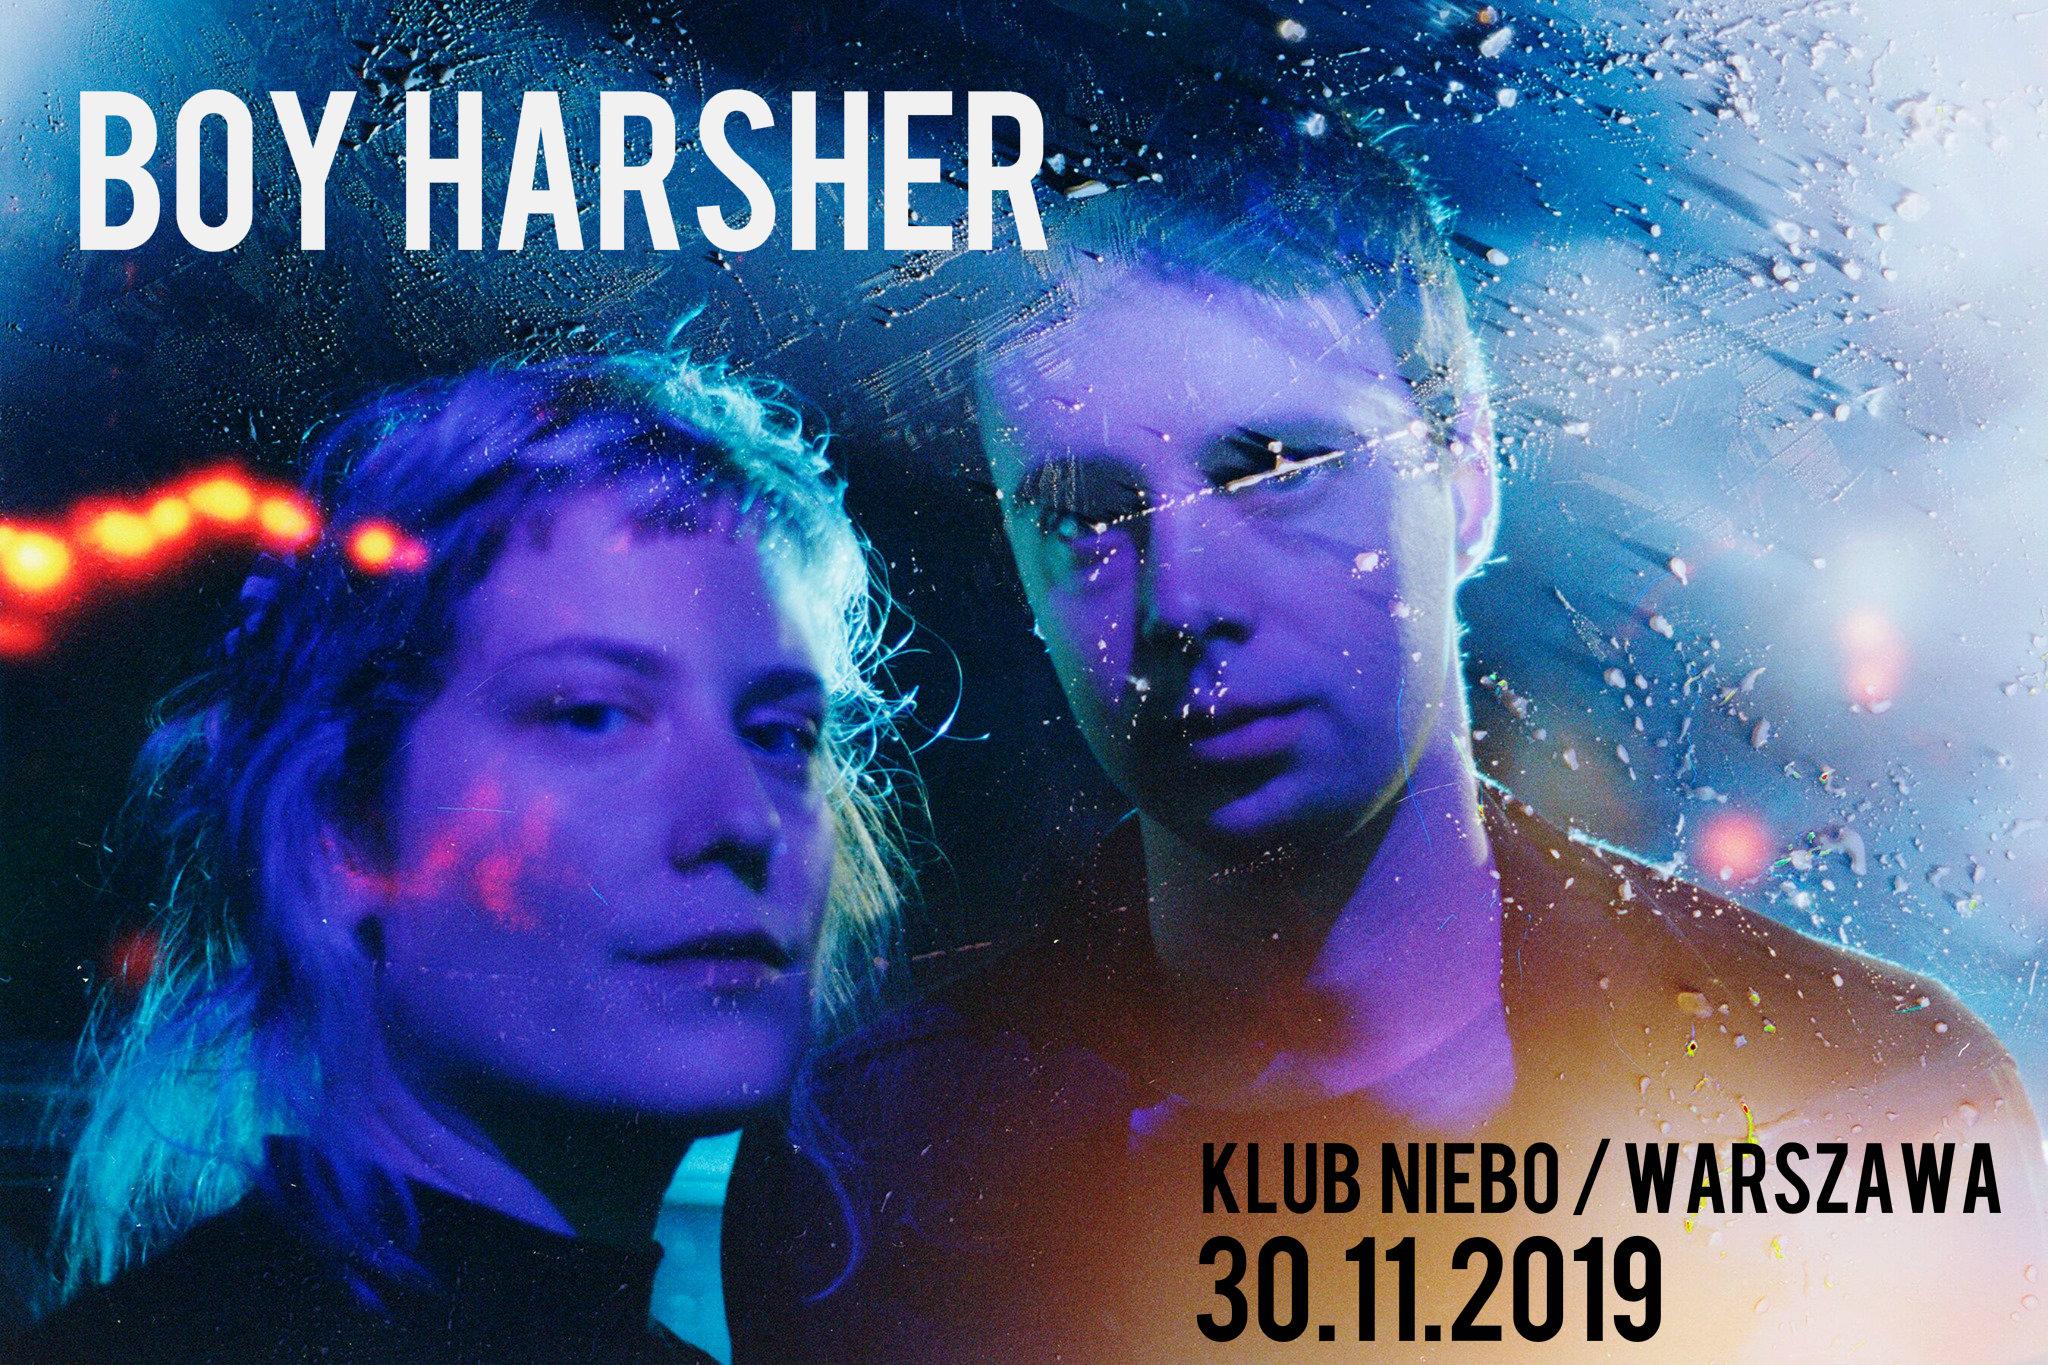 Boy Harsher (Warszawa - Niebo - 30.11.2019)